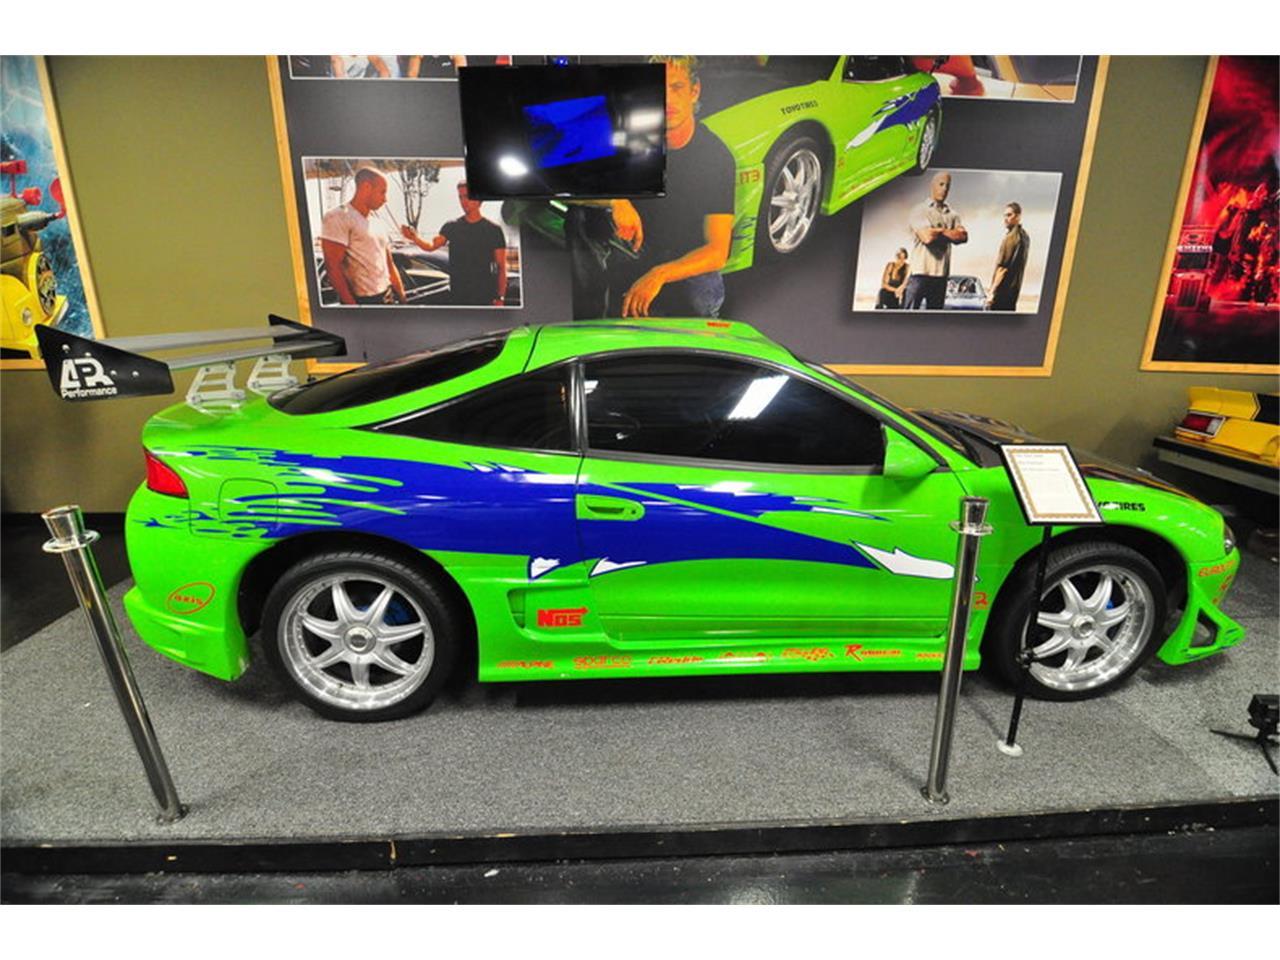 1995 mitsubishi eclipse gst for sale classiccars com cc 1047882 1995 mitsubishi eclipse gst for sale